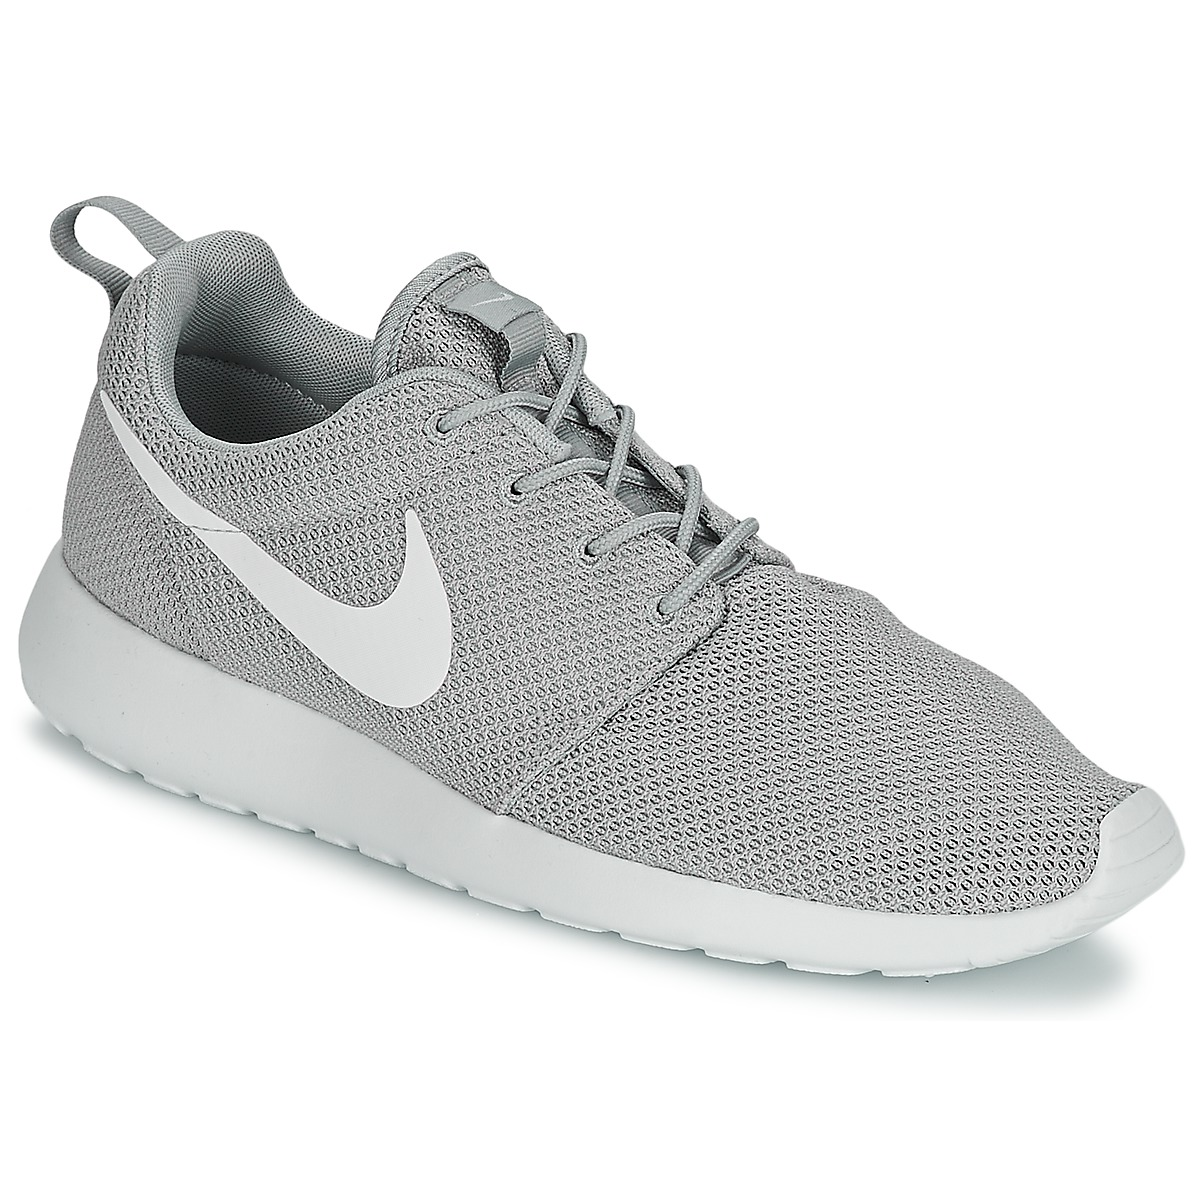 Nike ROSHE ONE Grau / Weiss - Kostenloser Versand bei Spartoode ! - Schuhe Sneaker Low Herren 63,00 €